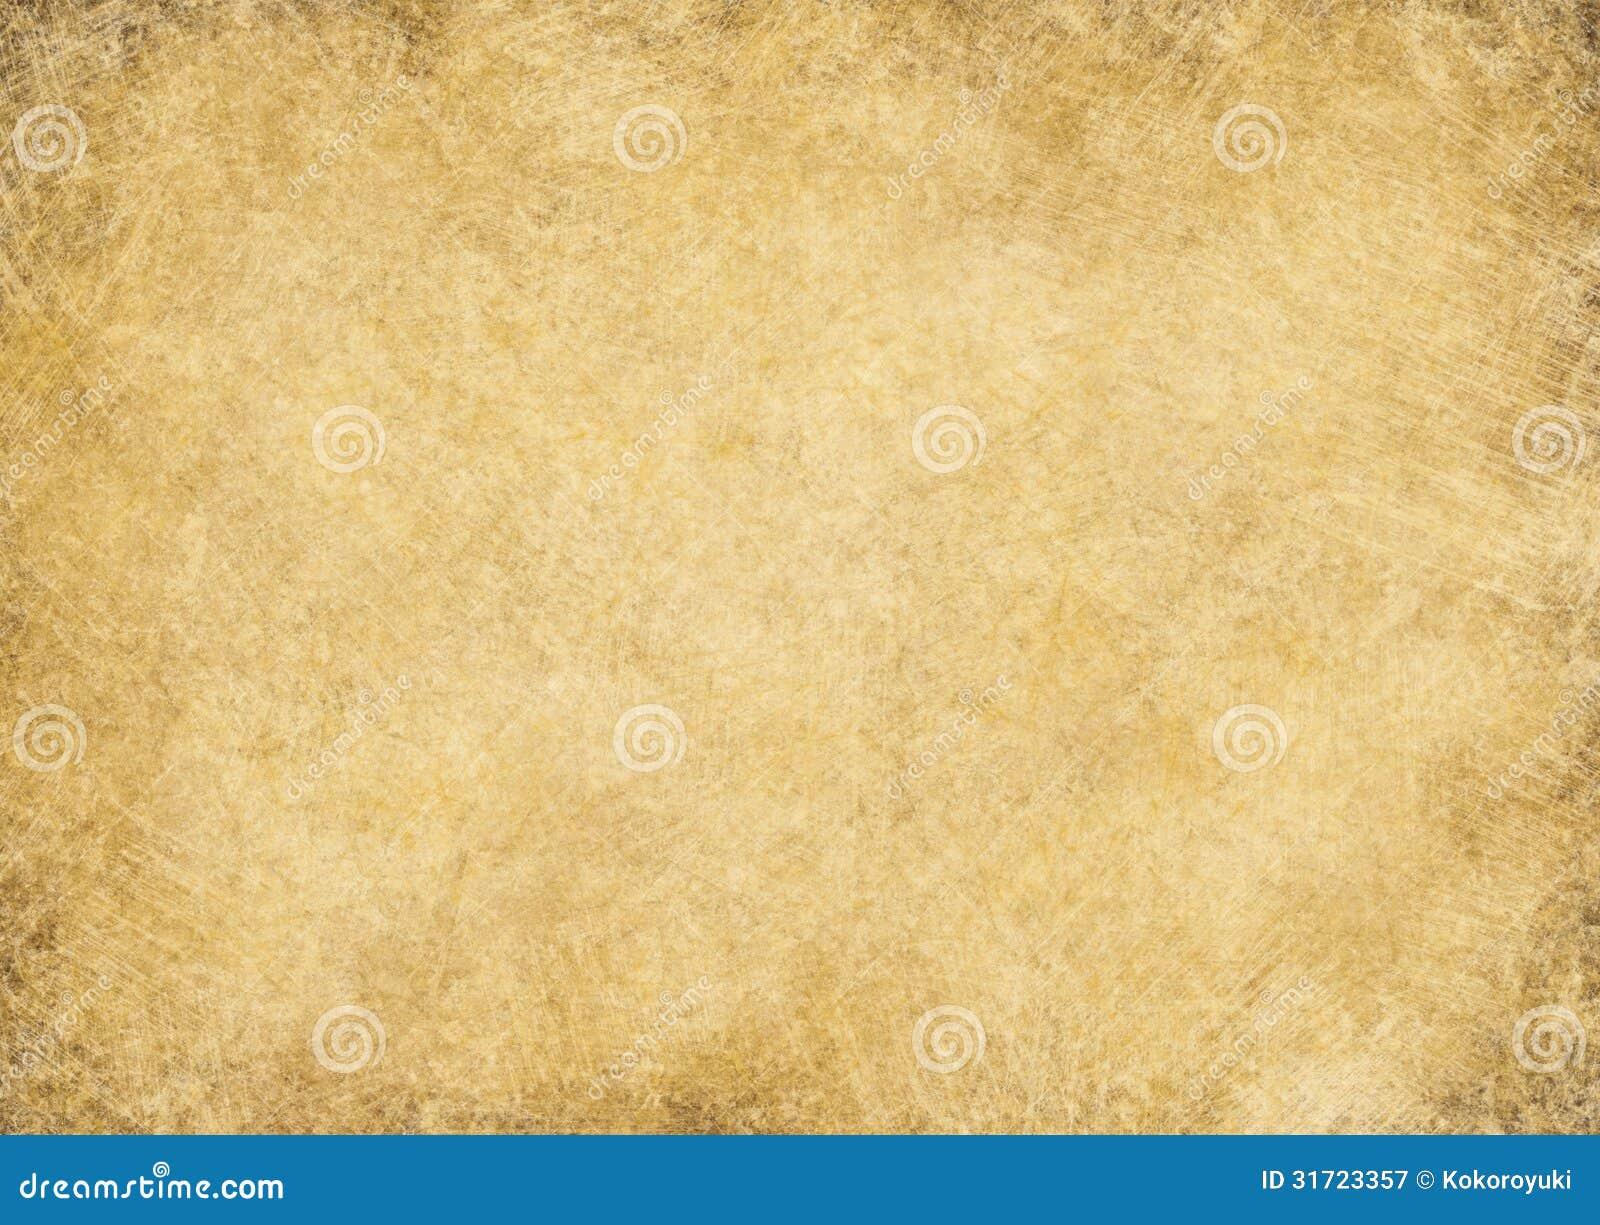 Altes Papier Lizenzfreie Stockfotografie - Bild: 31723357